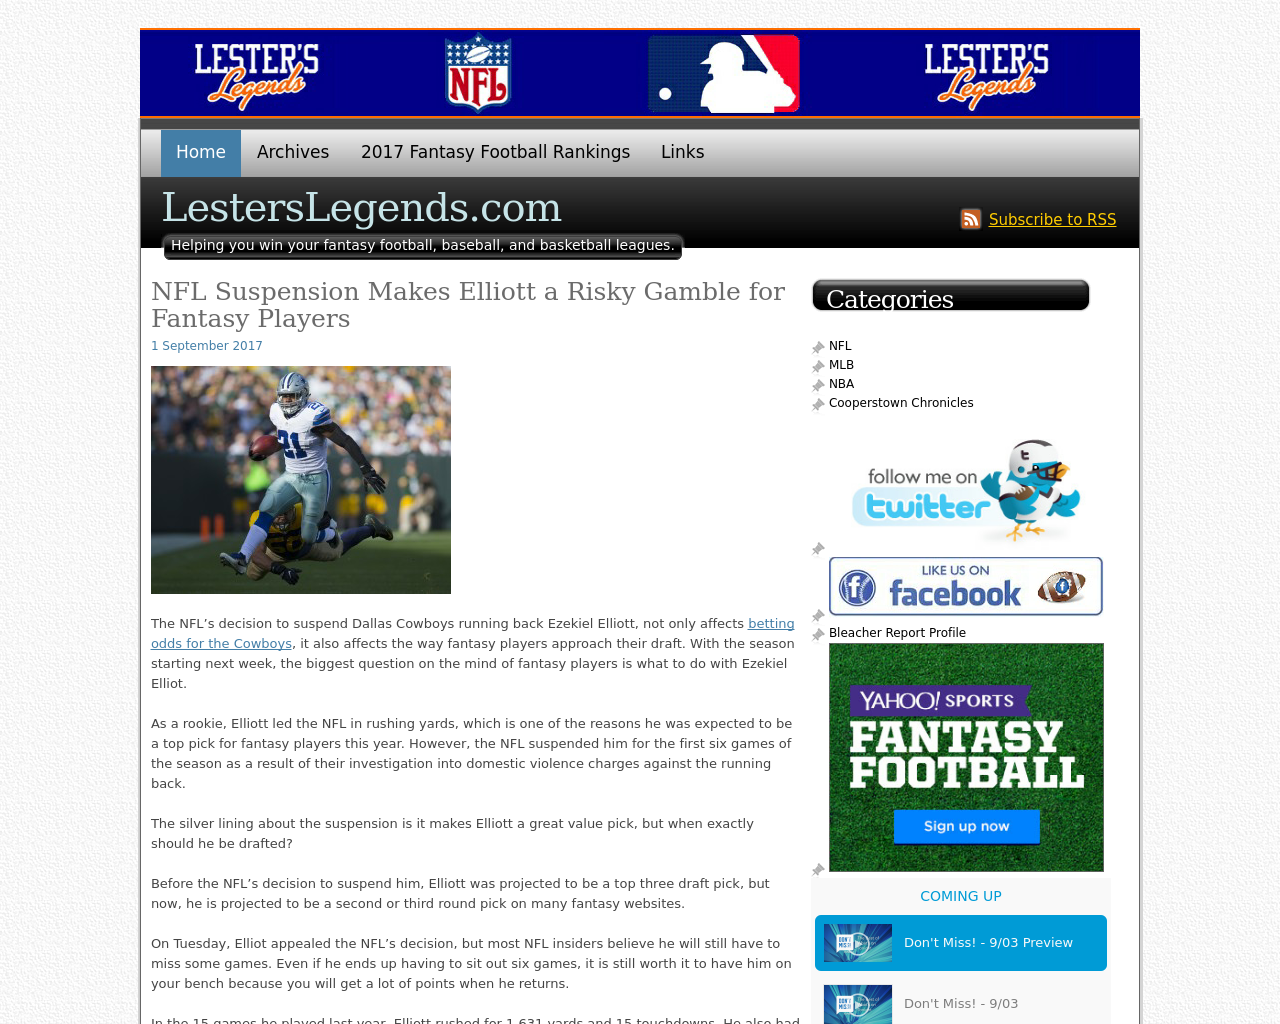 LestersLegends-Advertising-Reviews-Pricing